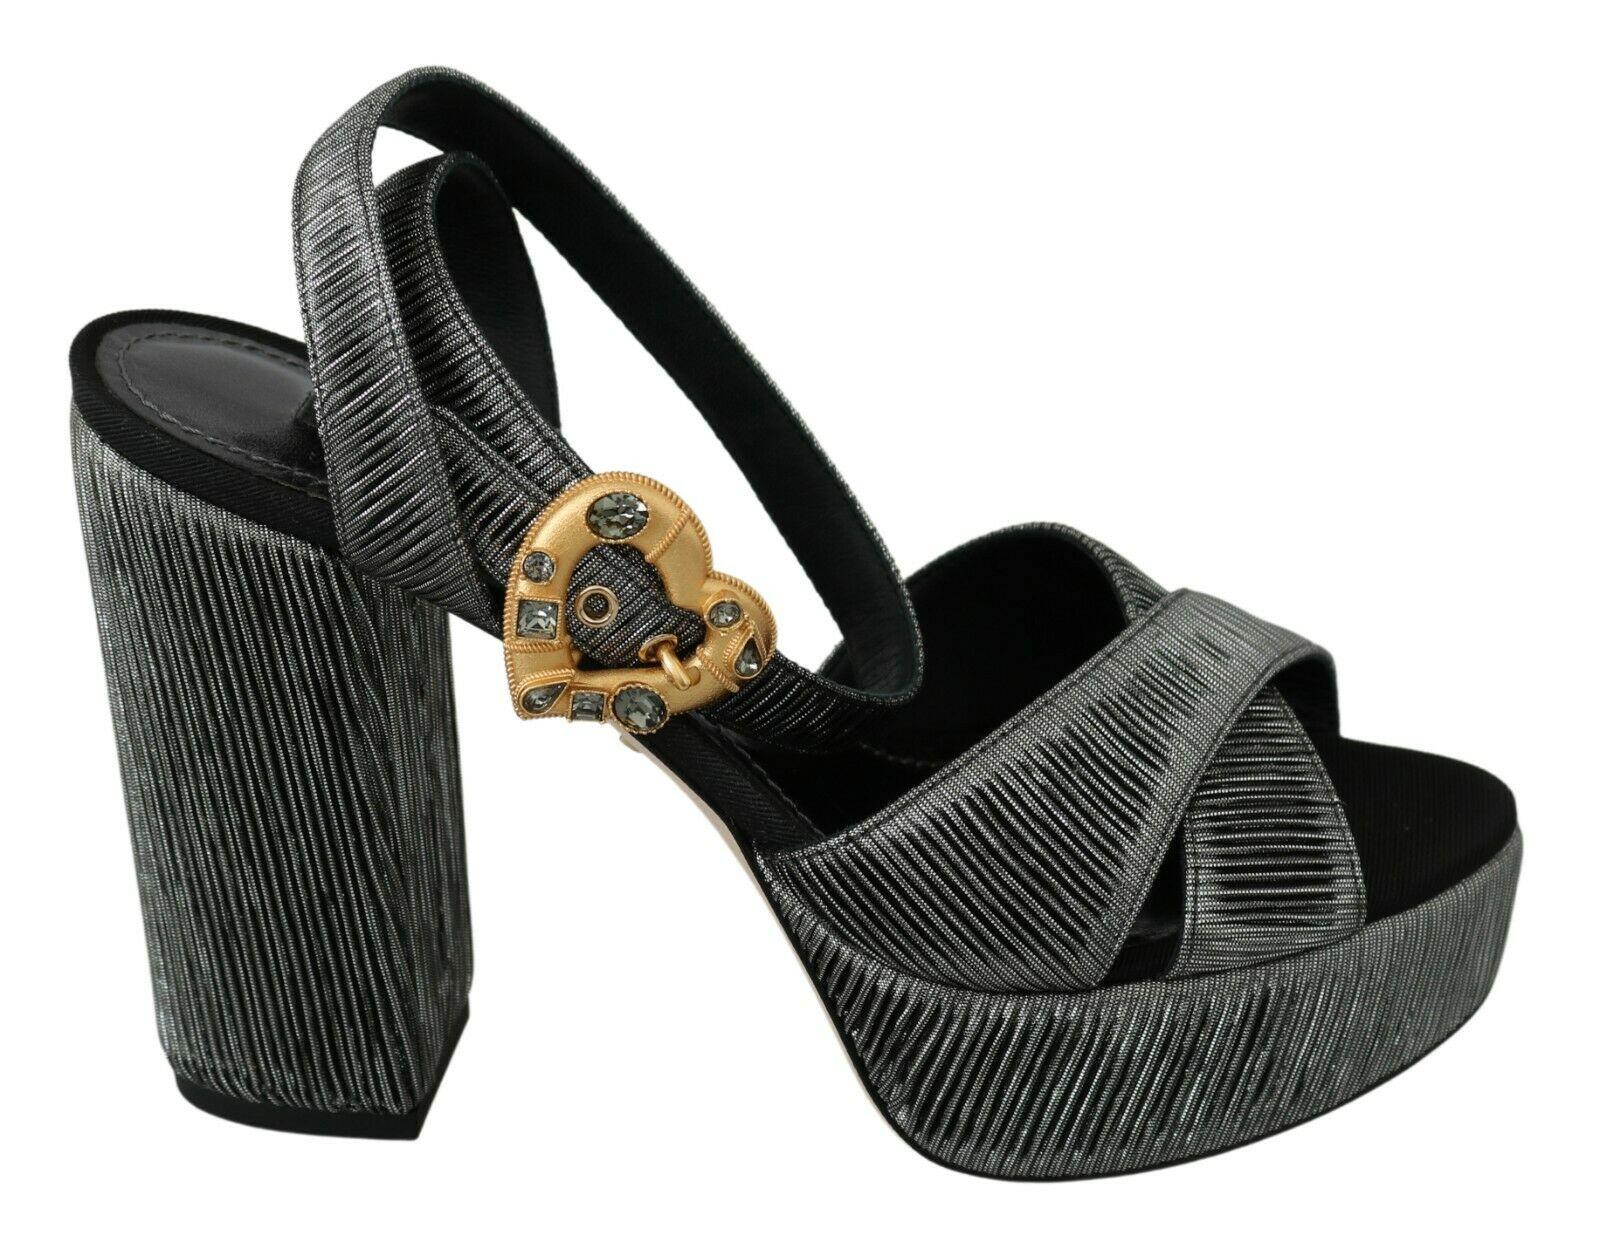 Dolce & Gabbana Women's Heart Sandals Gray LA6579 - EU35/US4.5